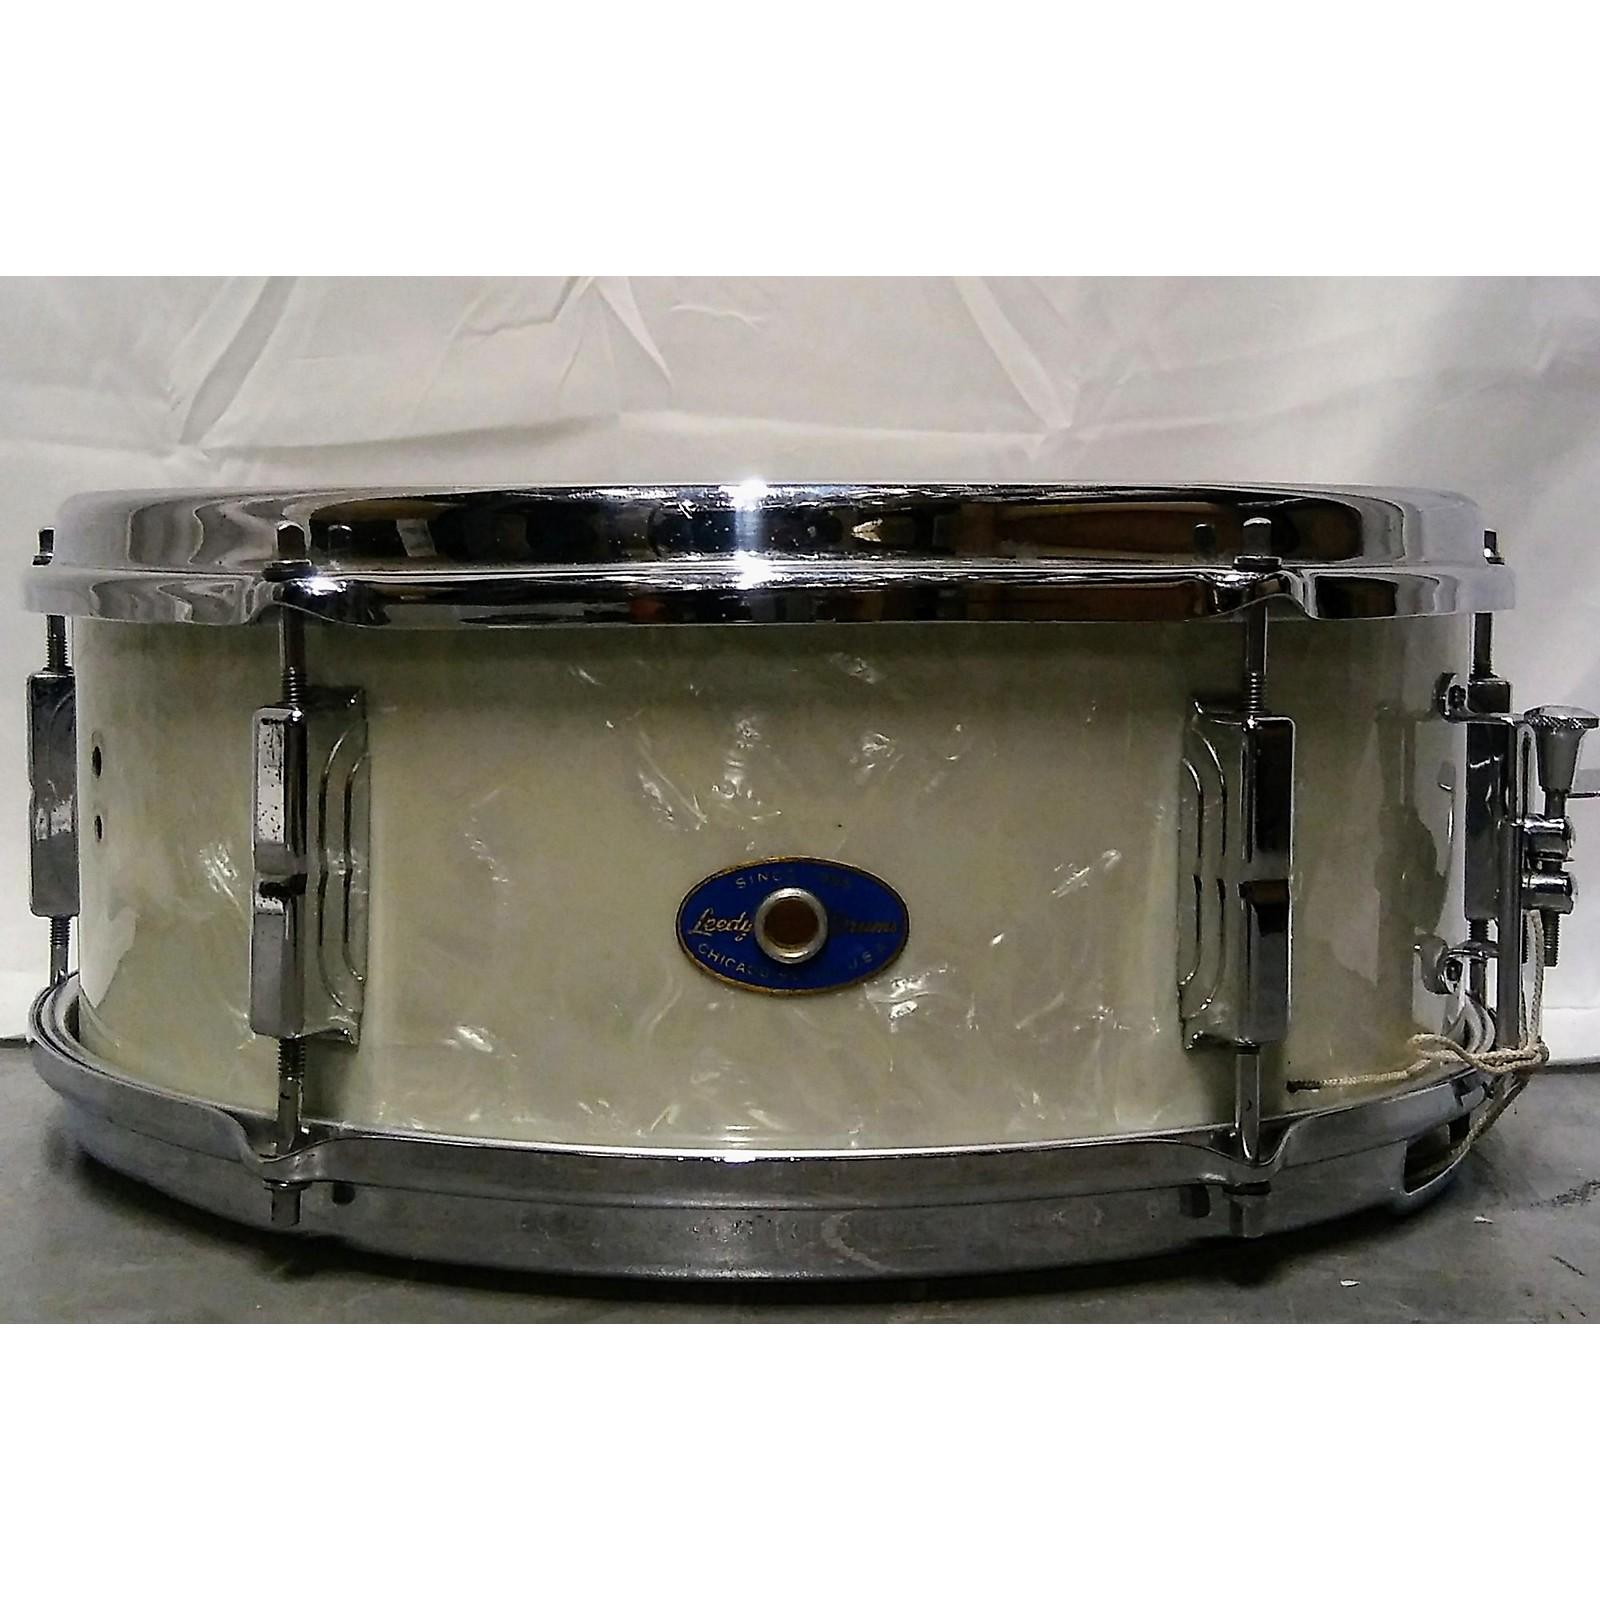 Leedy 5.5X14 Snare Drum